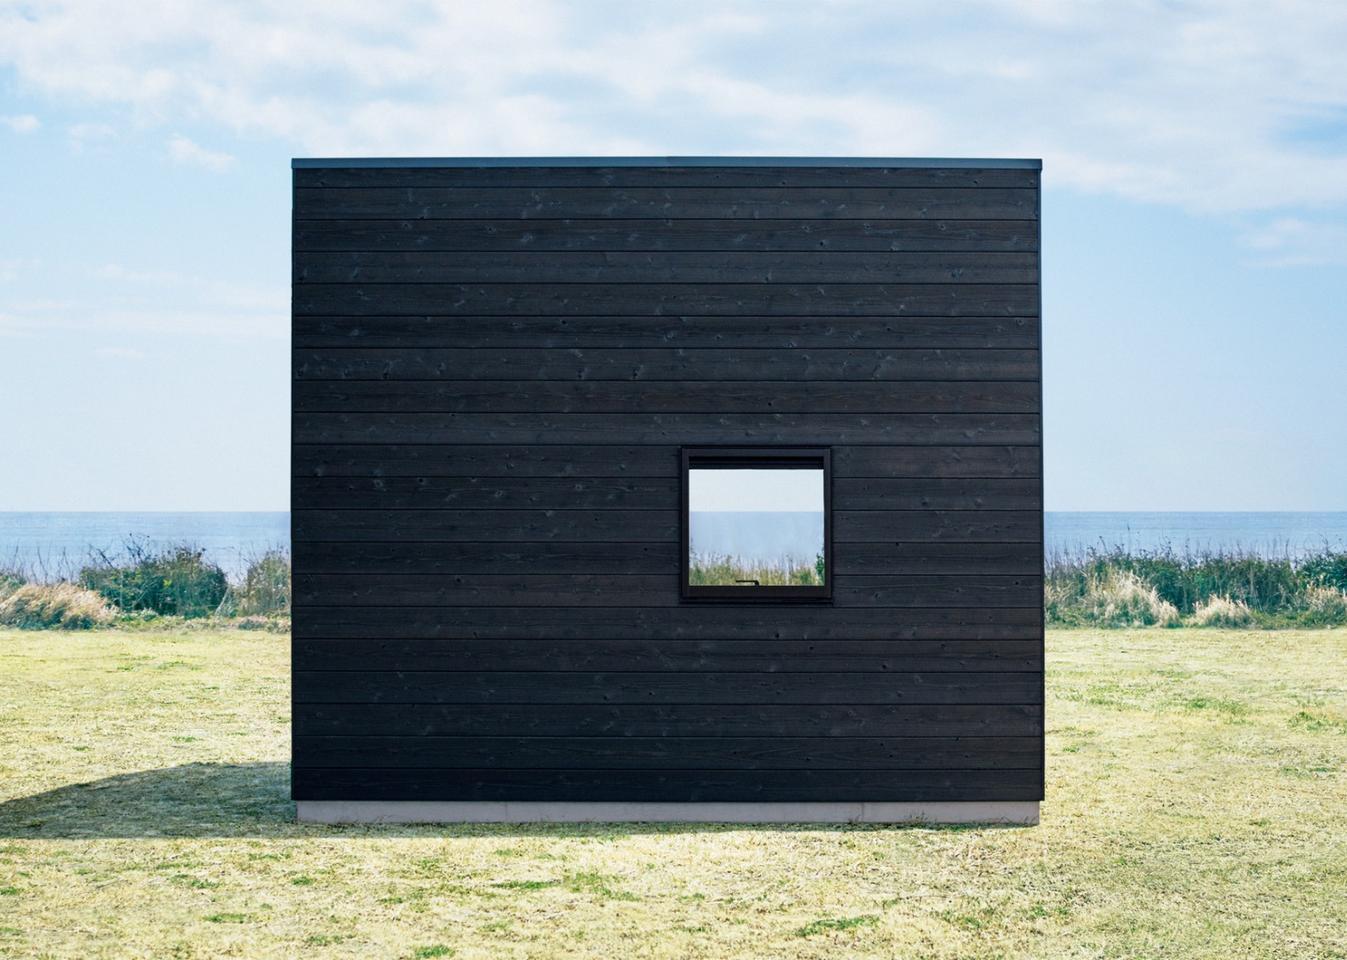 The Muji Hut'sexterior is Shou Sugi Ban-treated cedar